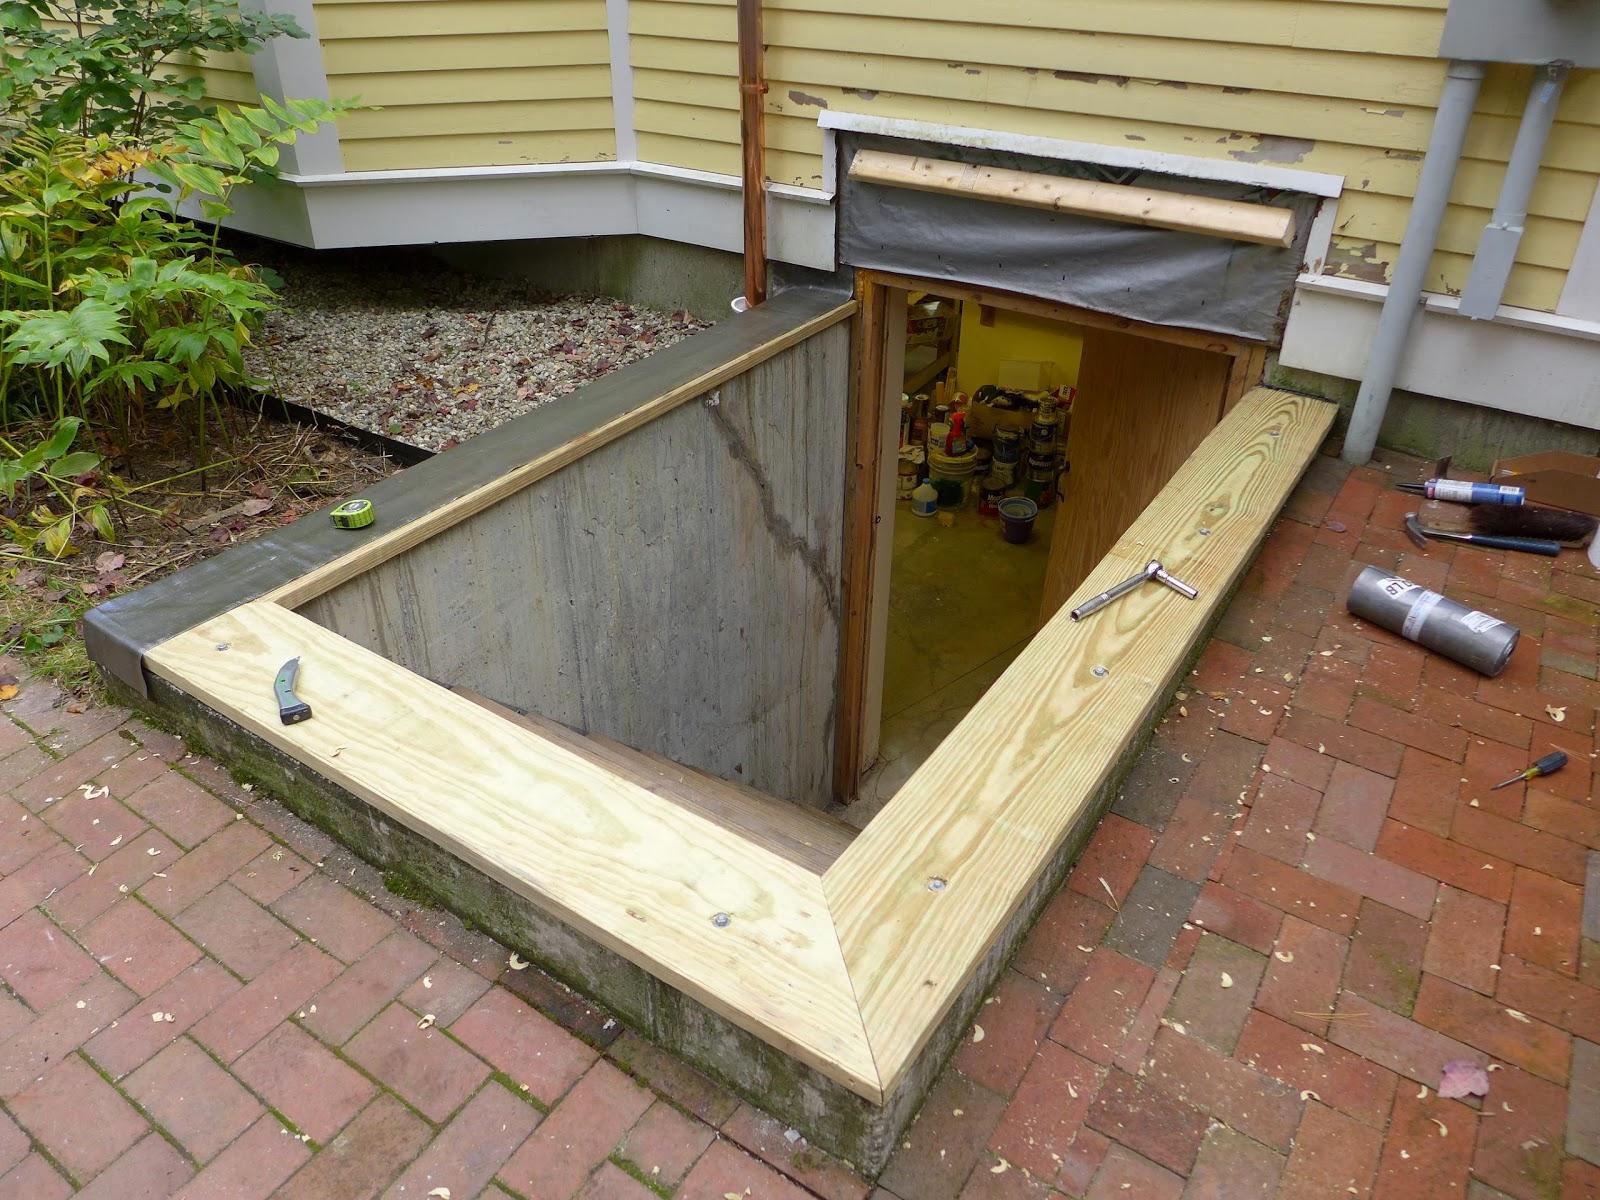 Bilco Bulkhead Doors. Nails And Sawdust: Rebuilding An Old